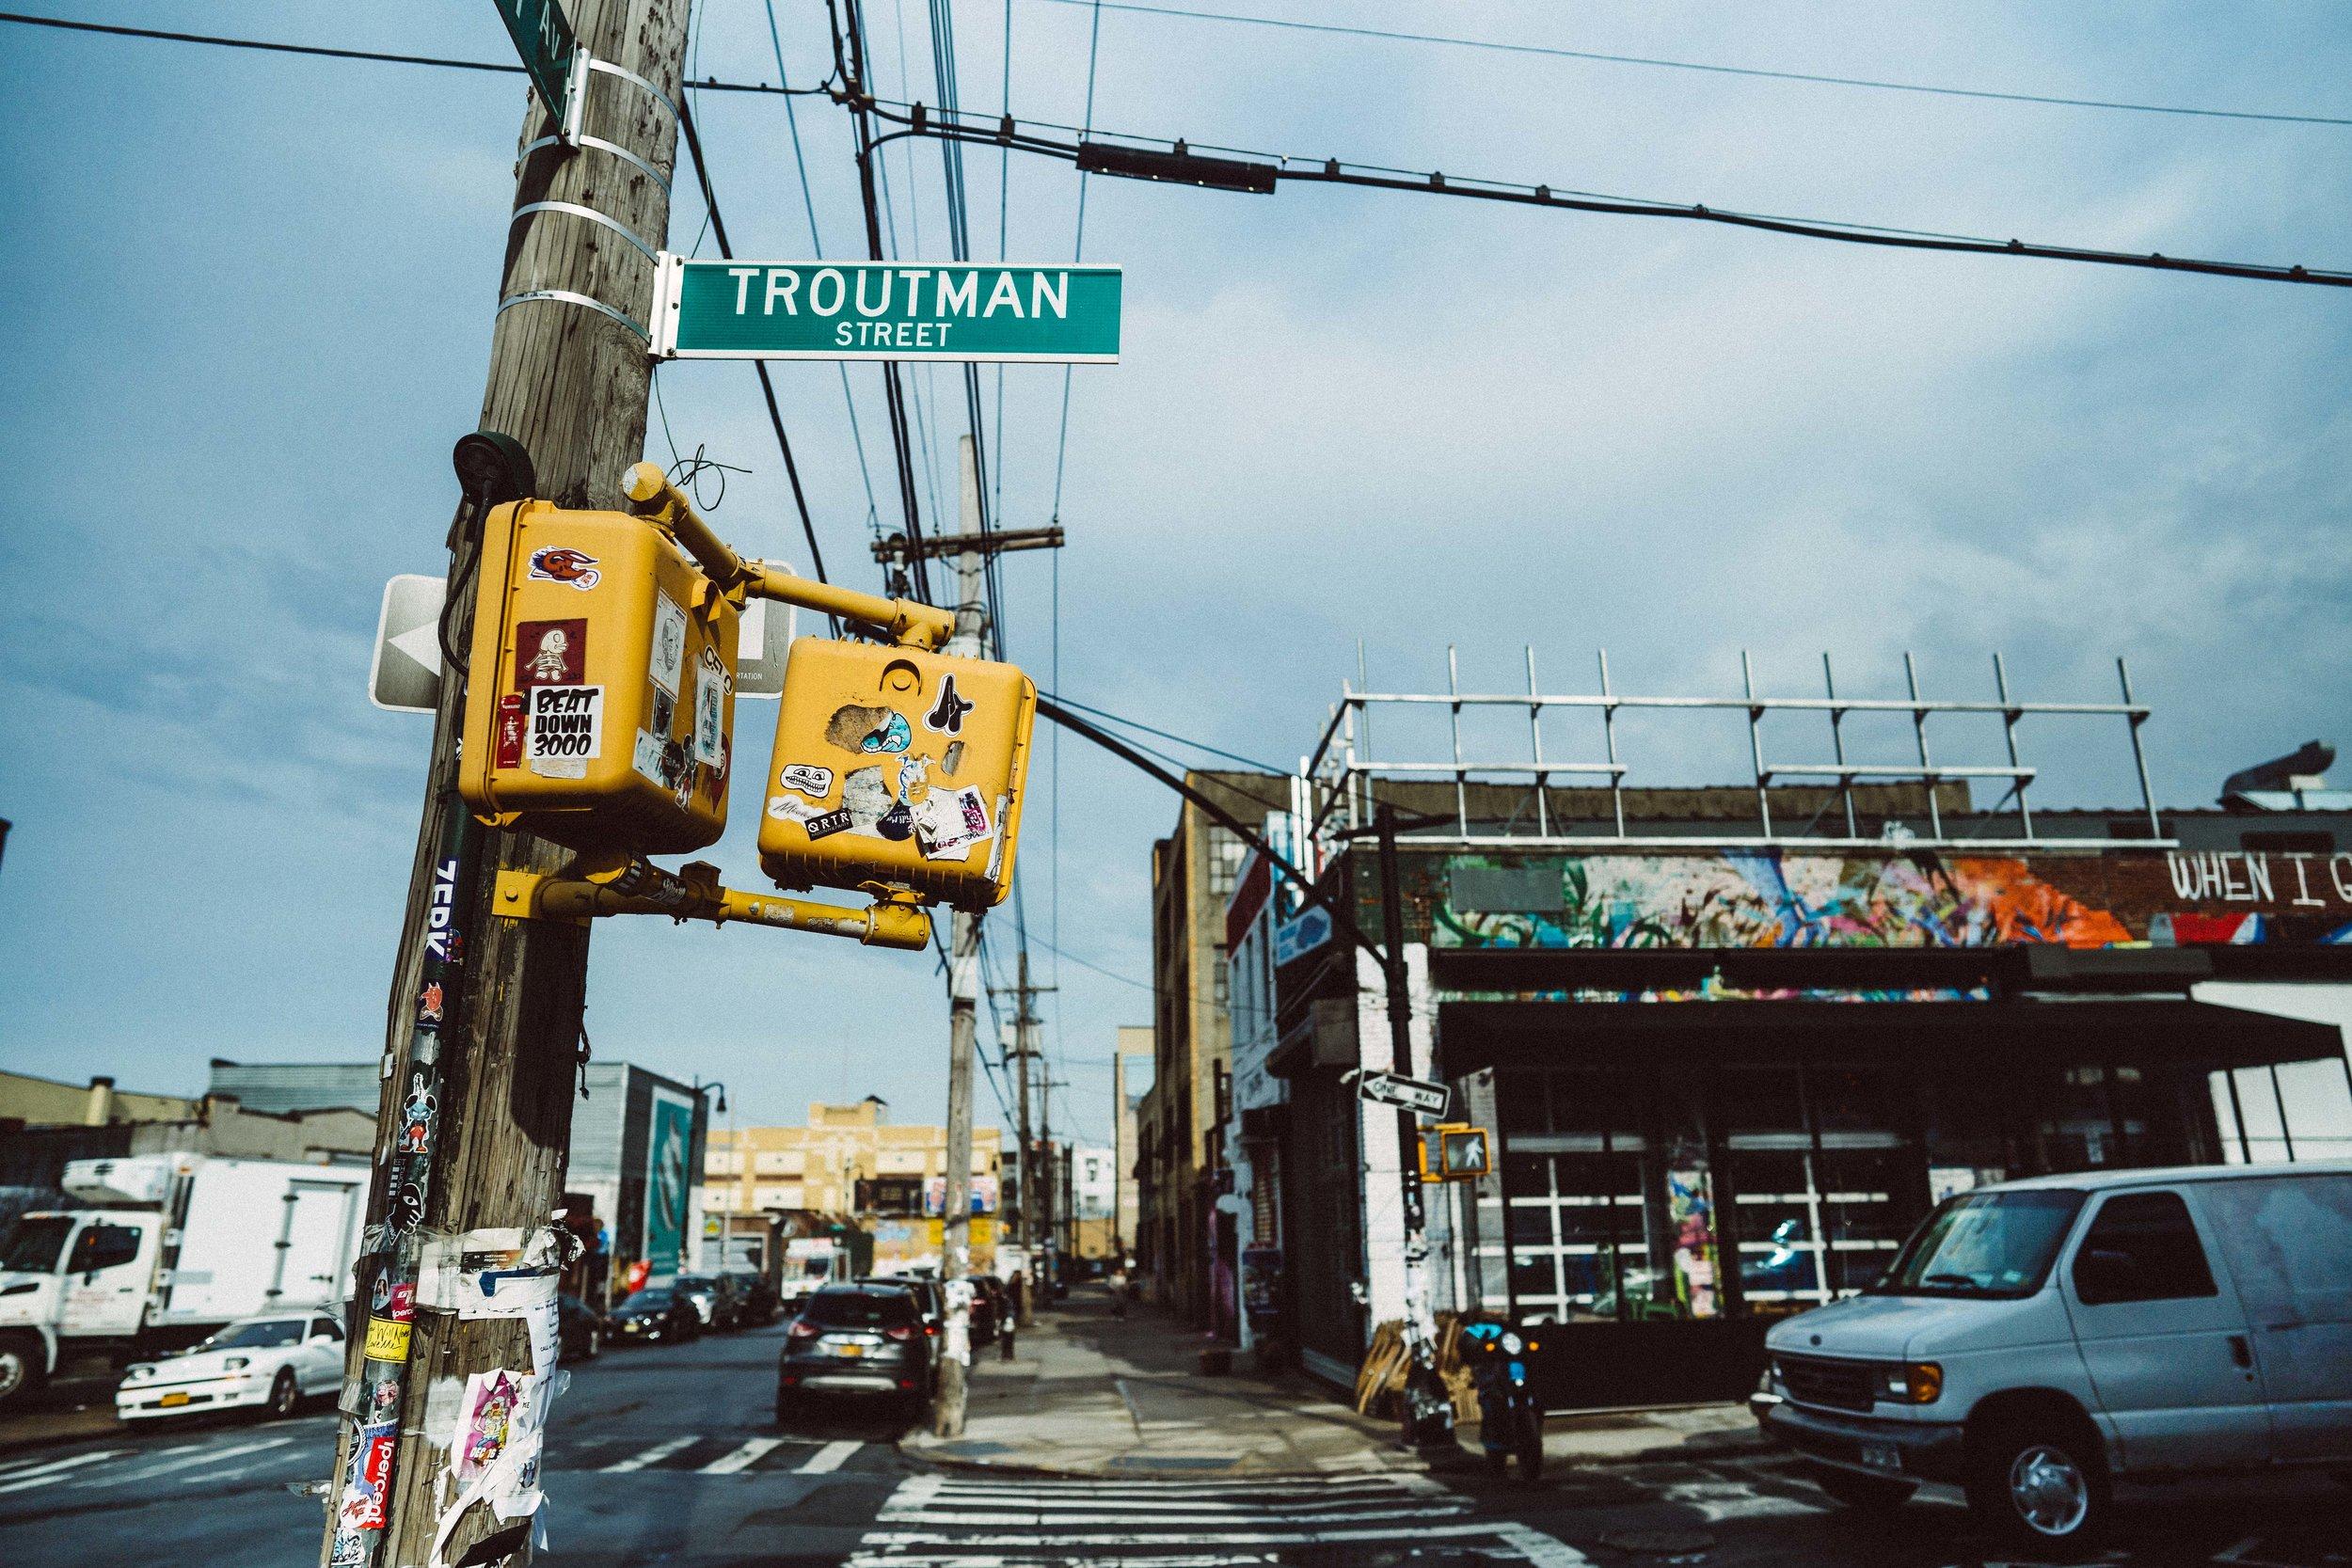 newyork-sony-101399.jpg